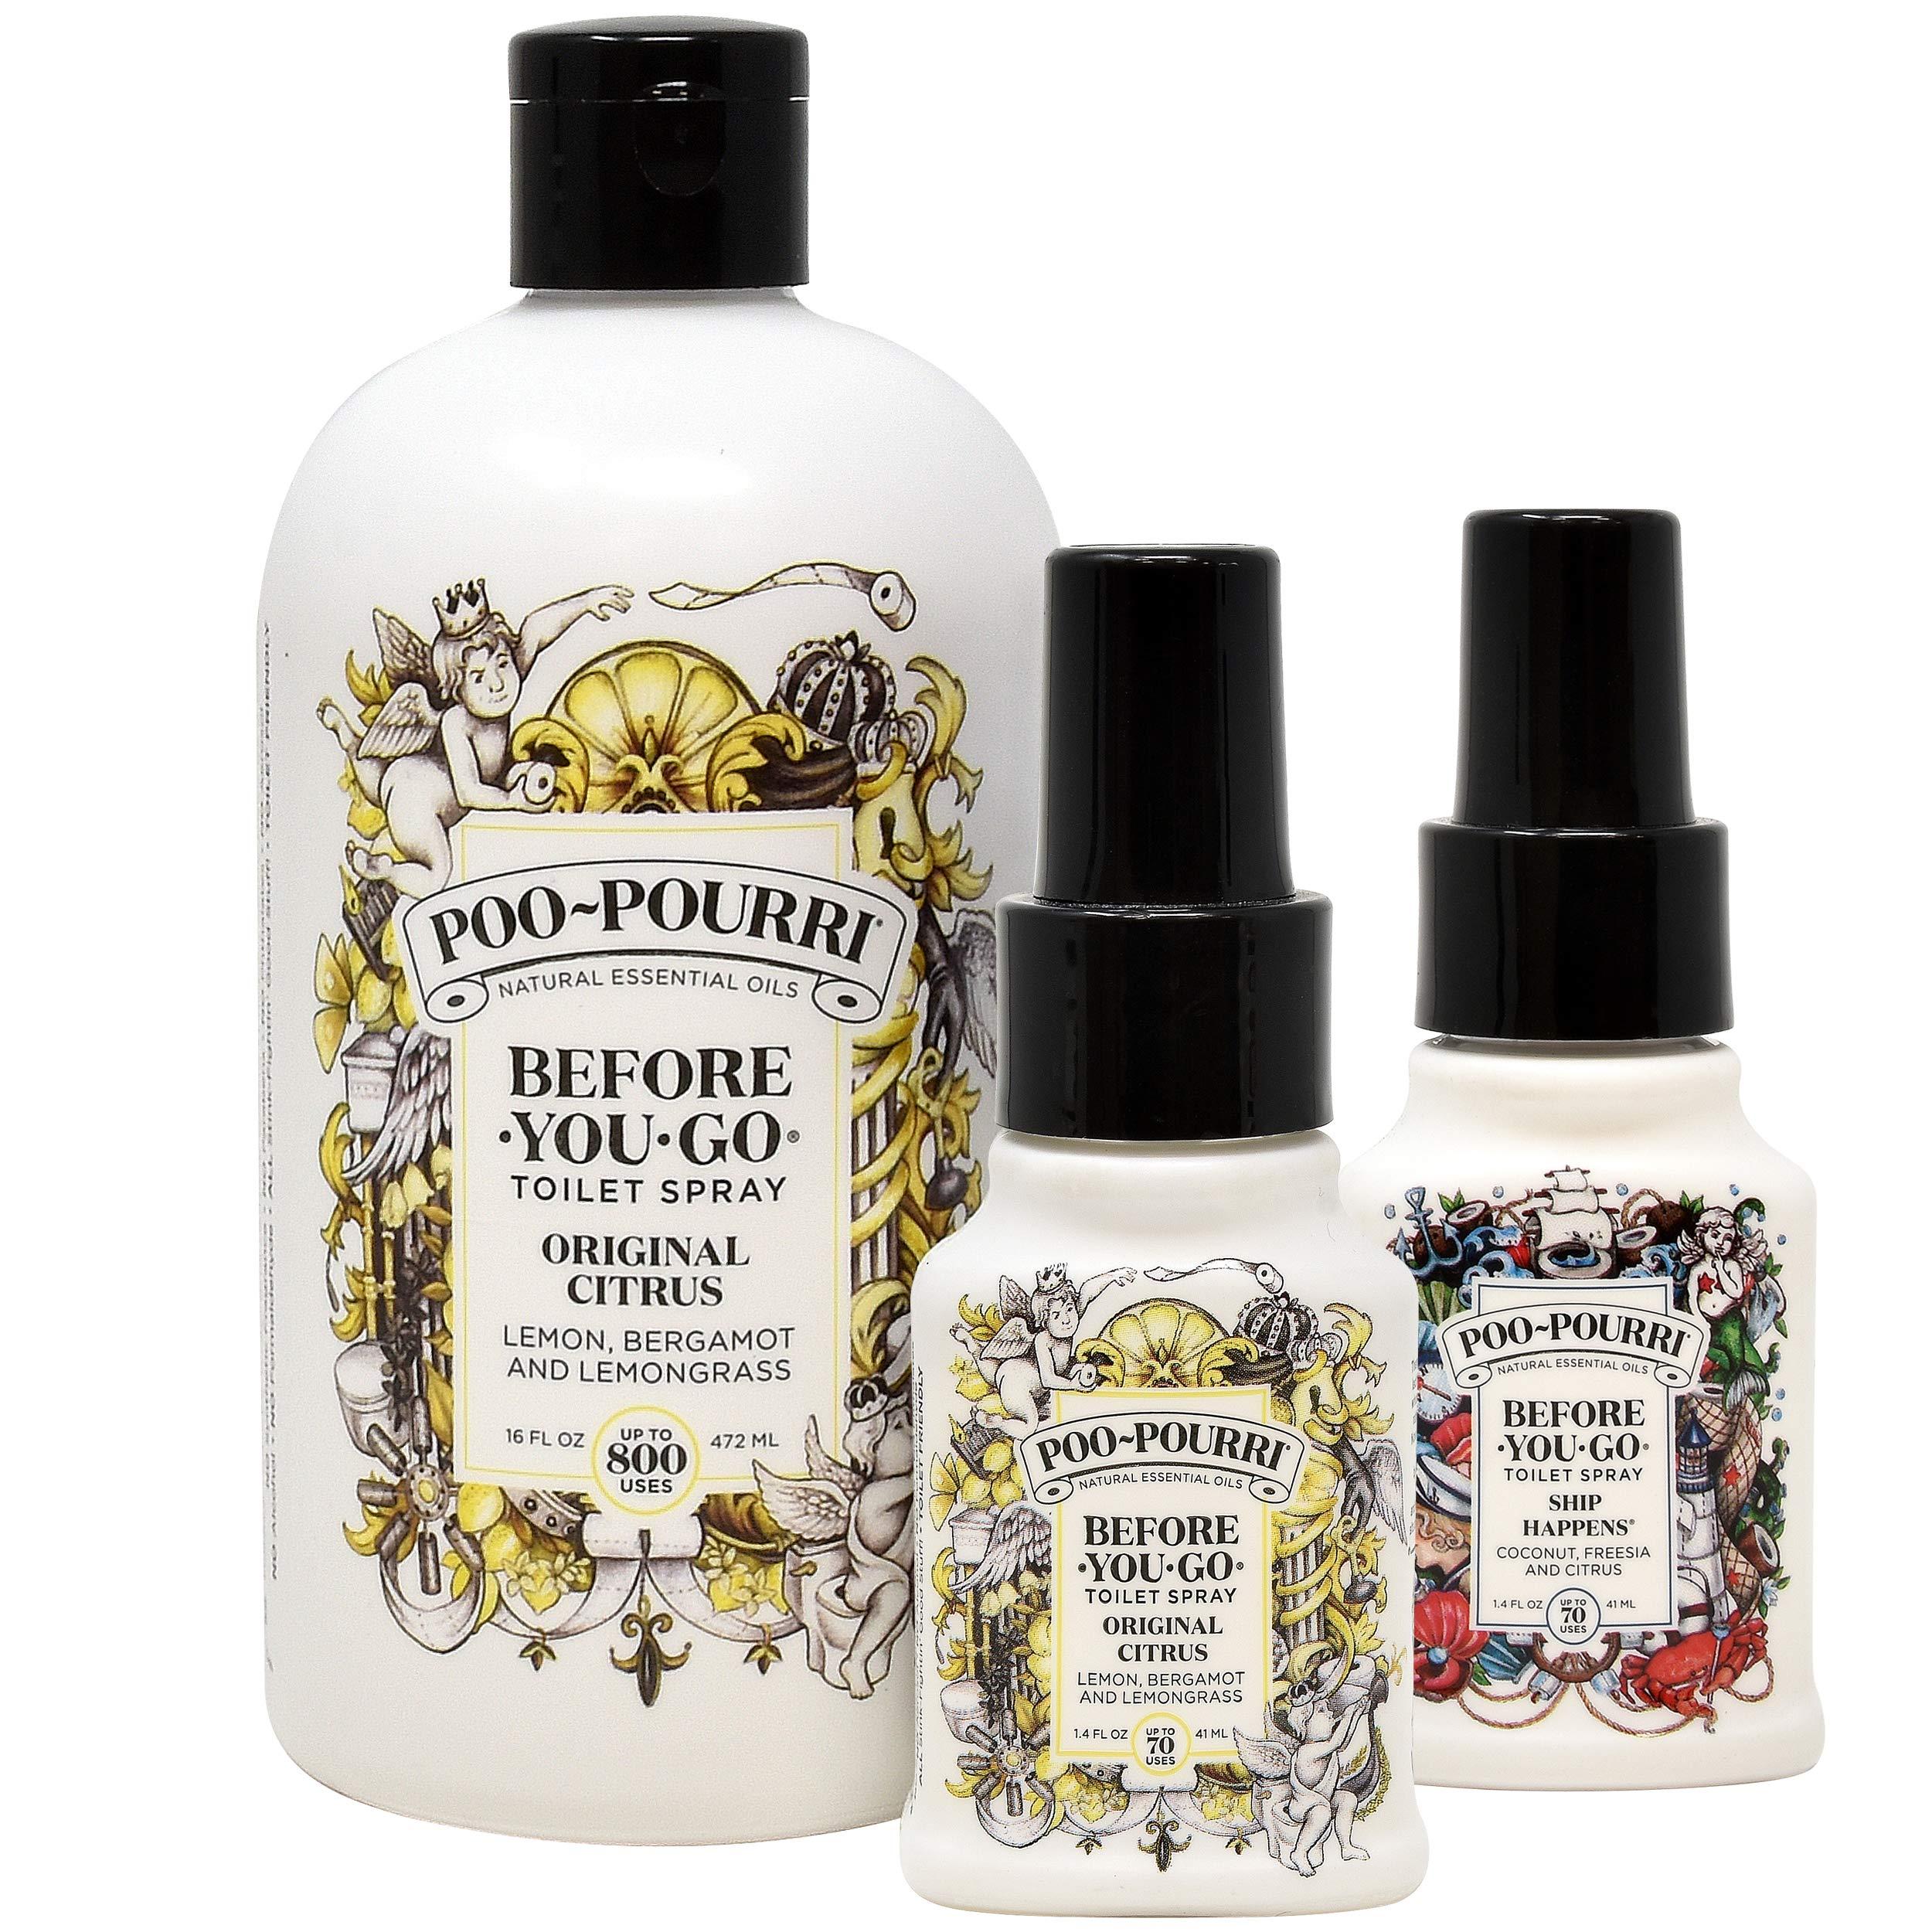 Poo-Pourri Original 16 Ounce Refill Bottle, Original 1.4 Ounce and Ship Happens 1.4 Ounce Bottle